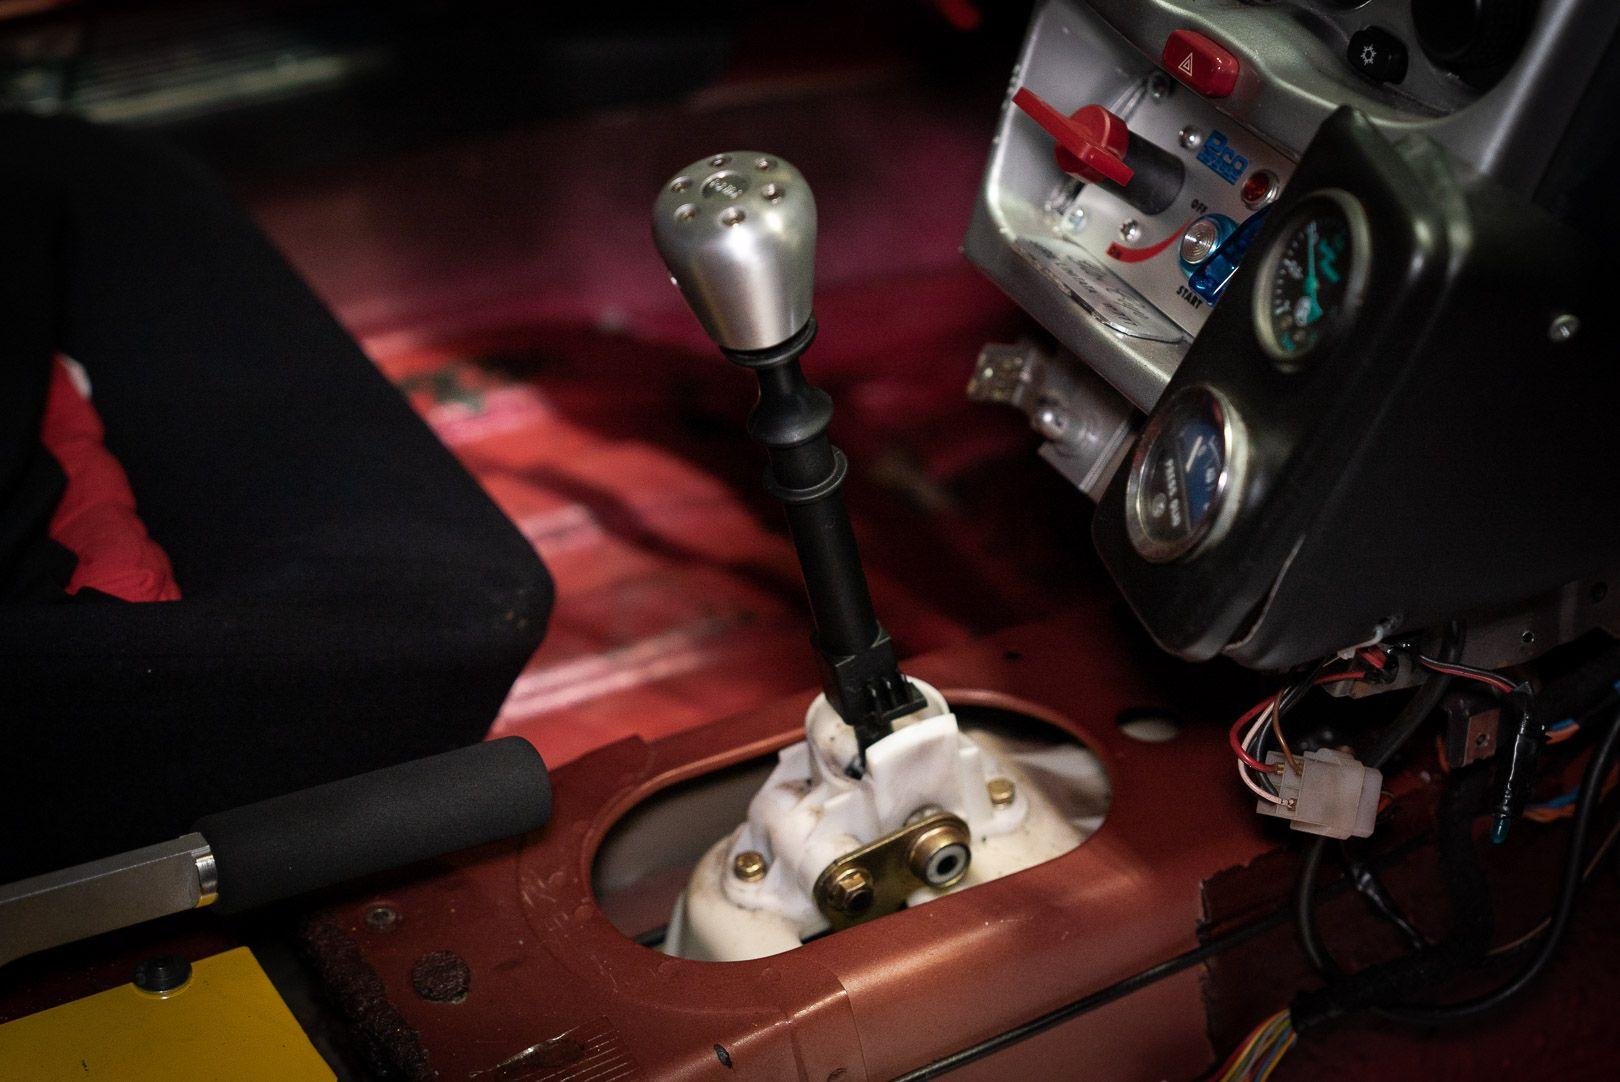 1995 Alfa Romeo GTV 2.0 V6 Turbo Cup Replica 59905